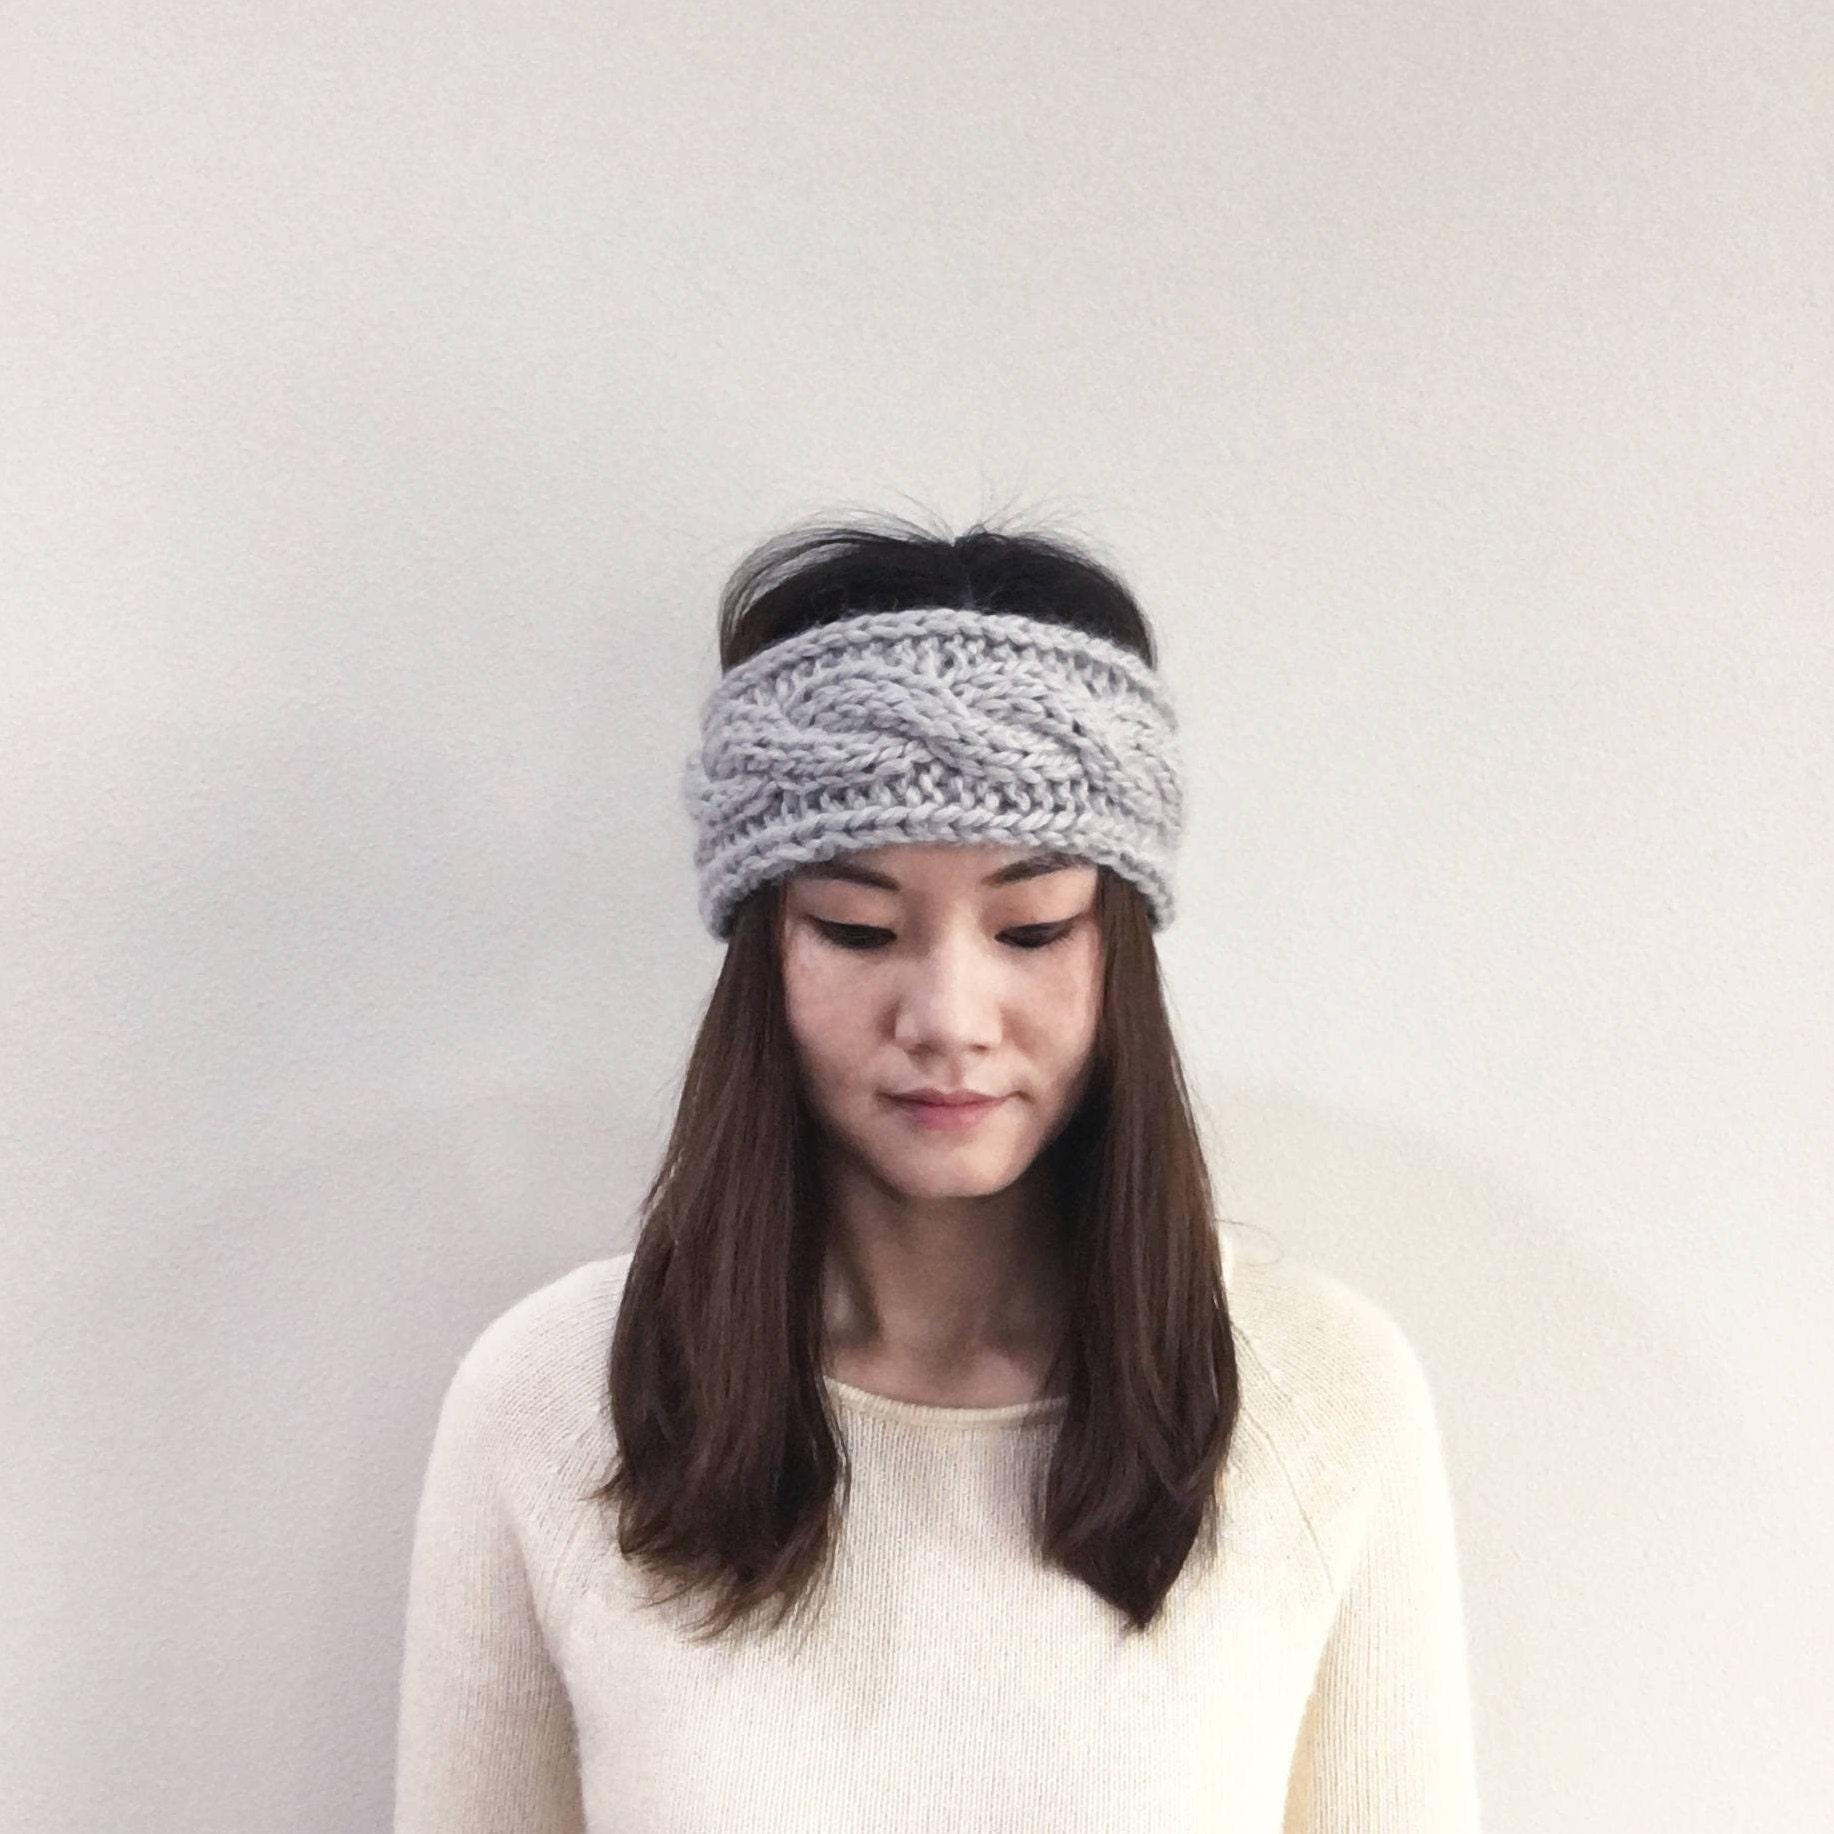 PATTERN-Adult Chunky Cable Knit Headband | Winter Headband | Ear ...